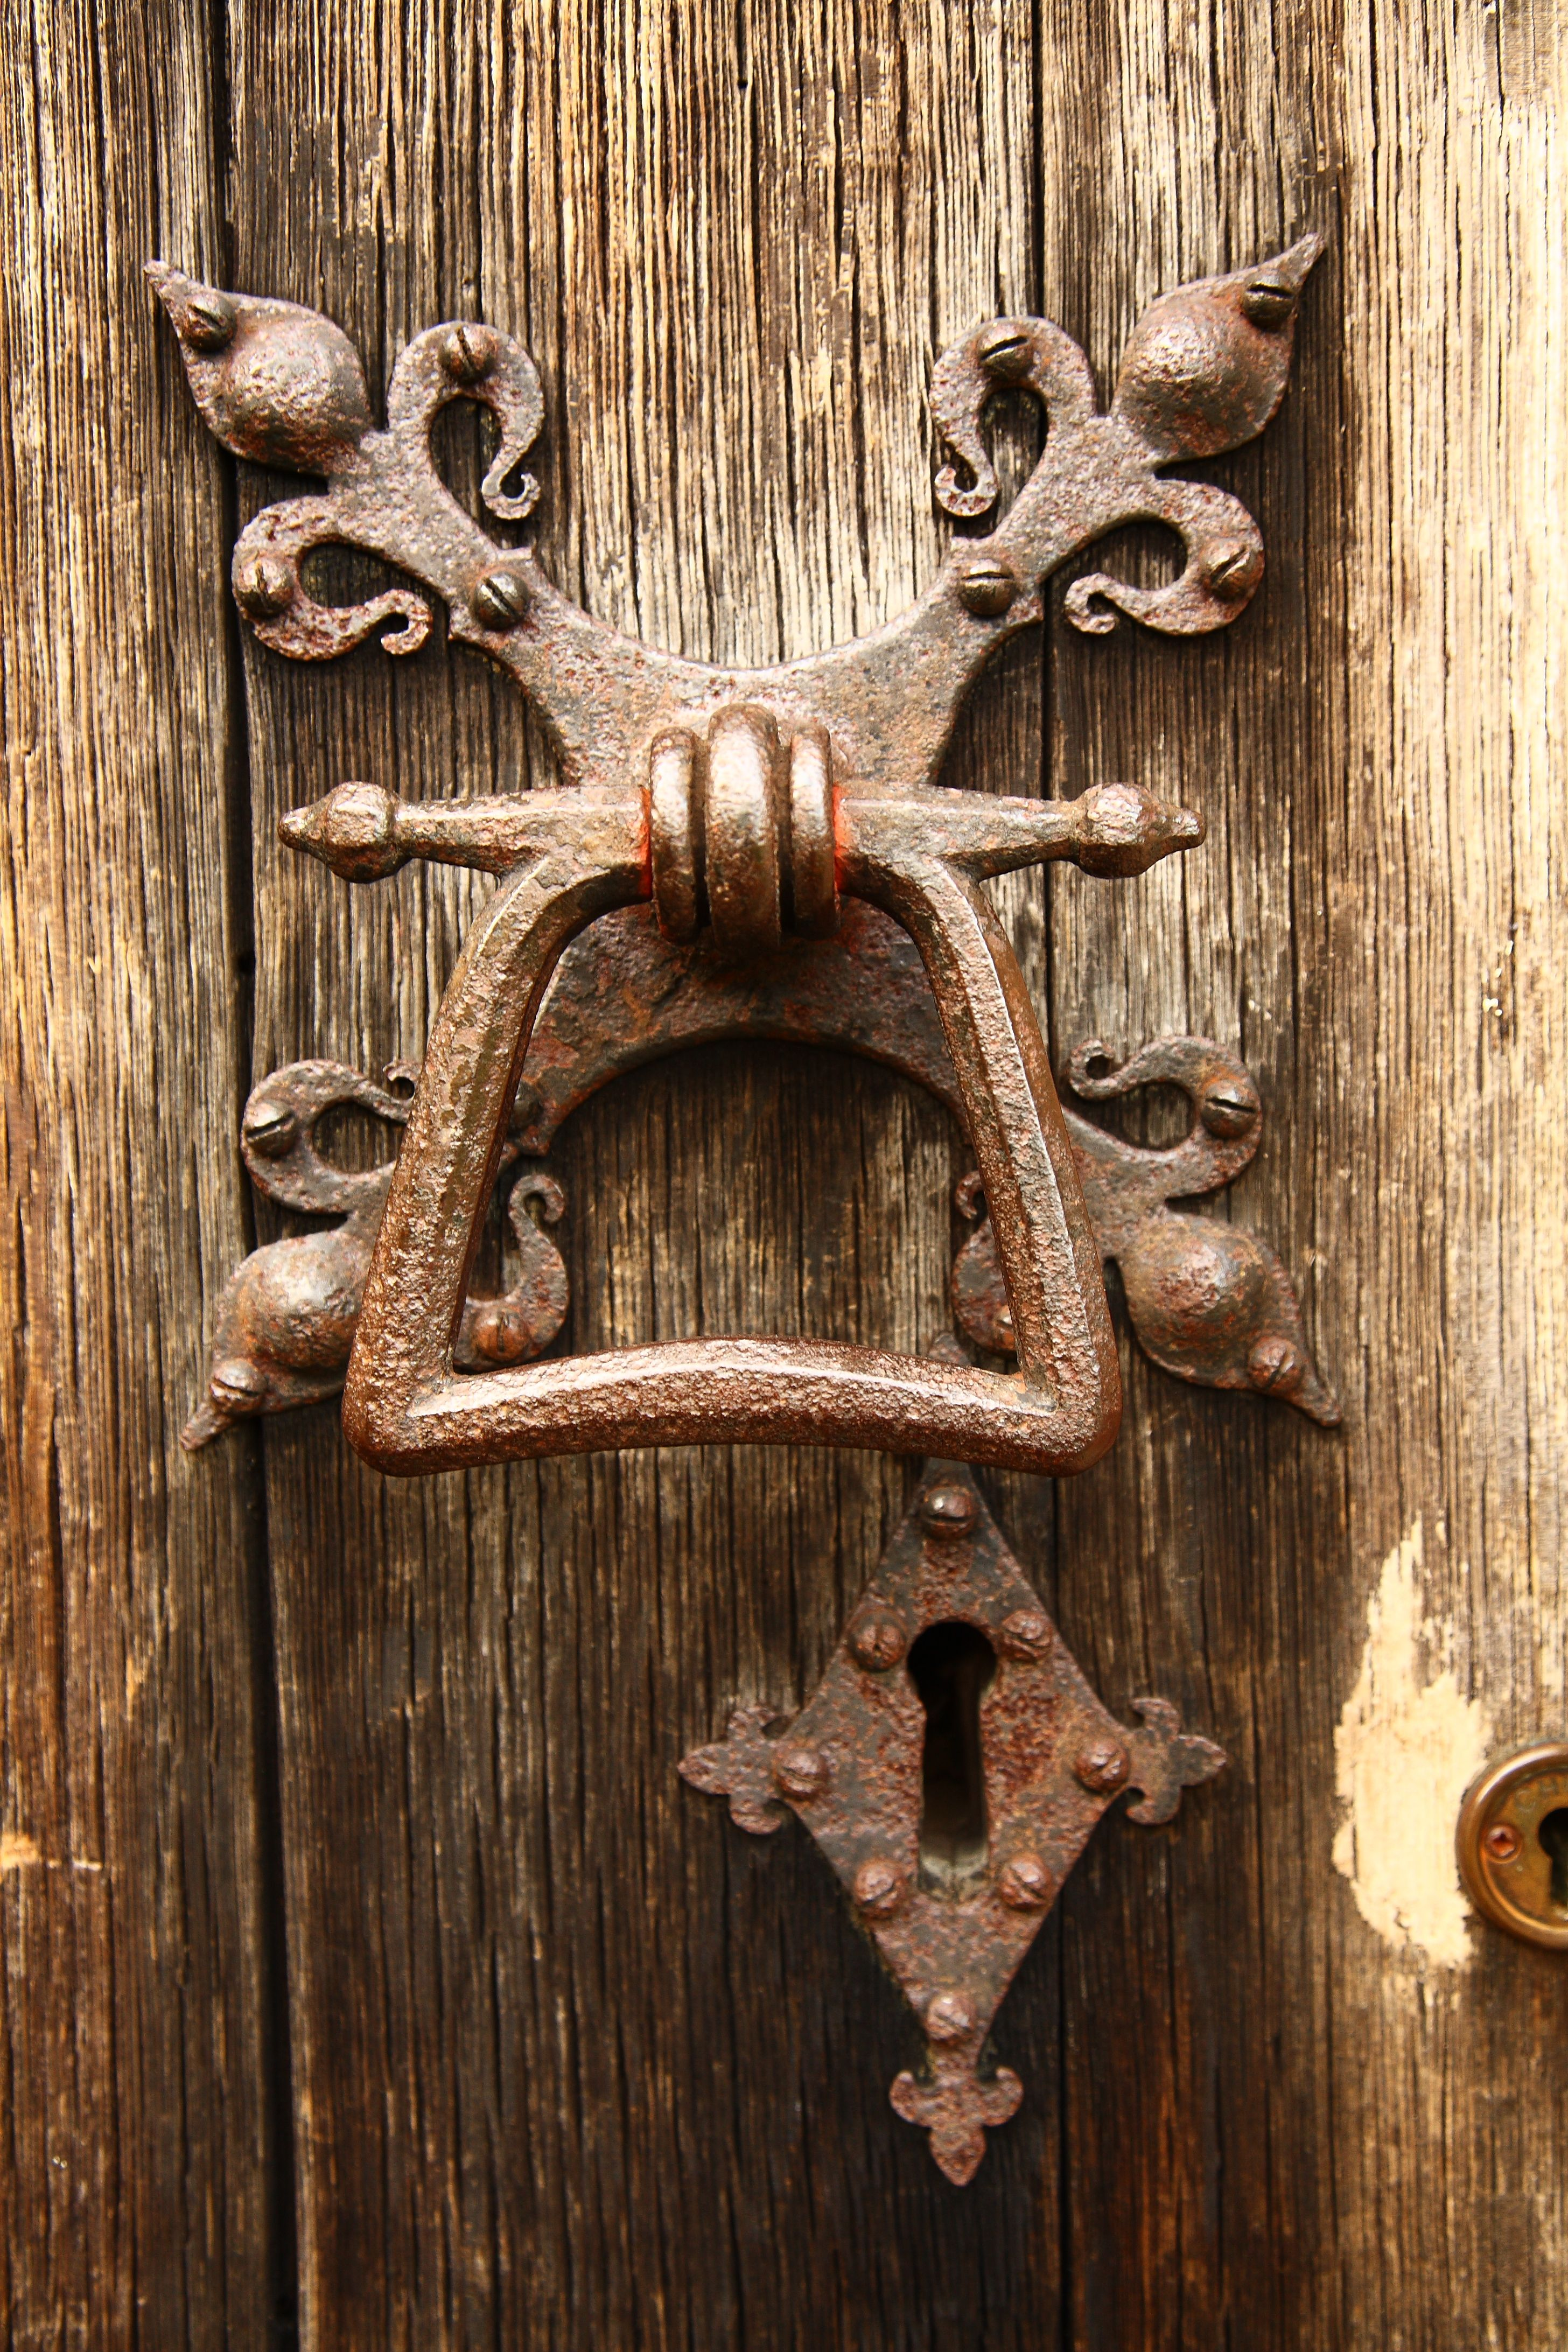 An entry from Emilialua | Door handles, Doors and Knock knock